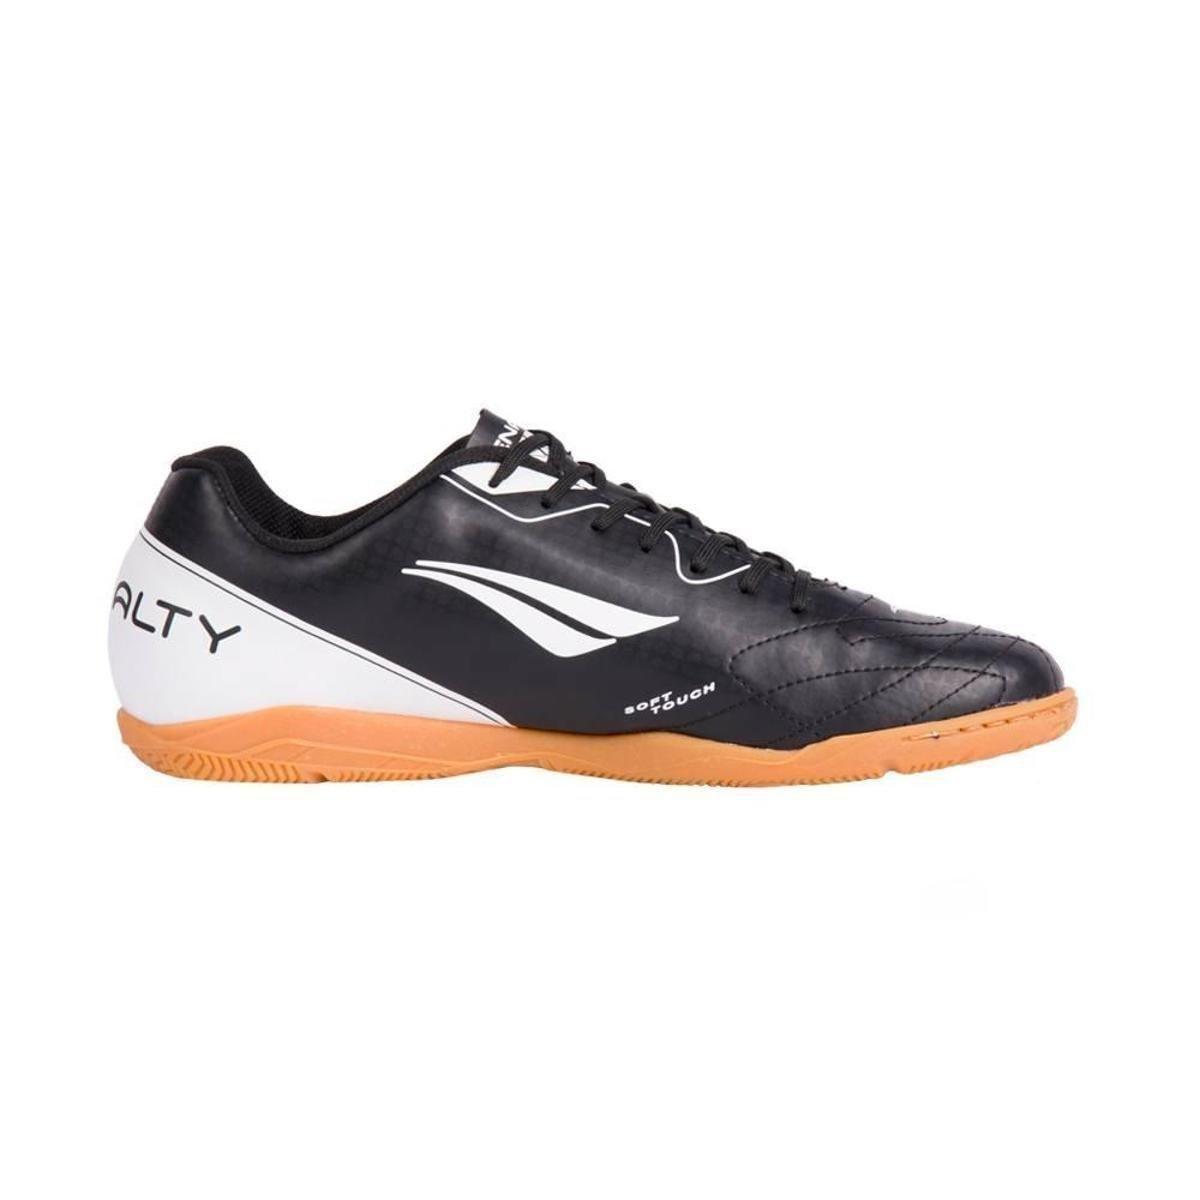 c555aebda6 Chuteira Penalty Matís VIII Futsal Masculina - Preto - Compre Agora ...